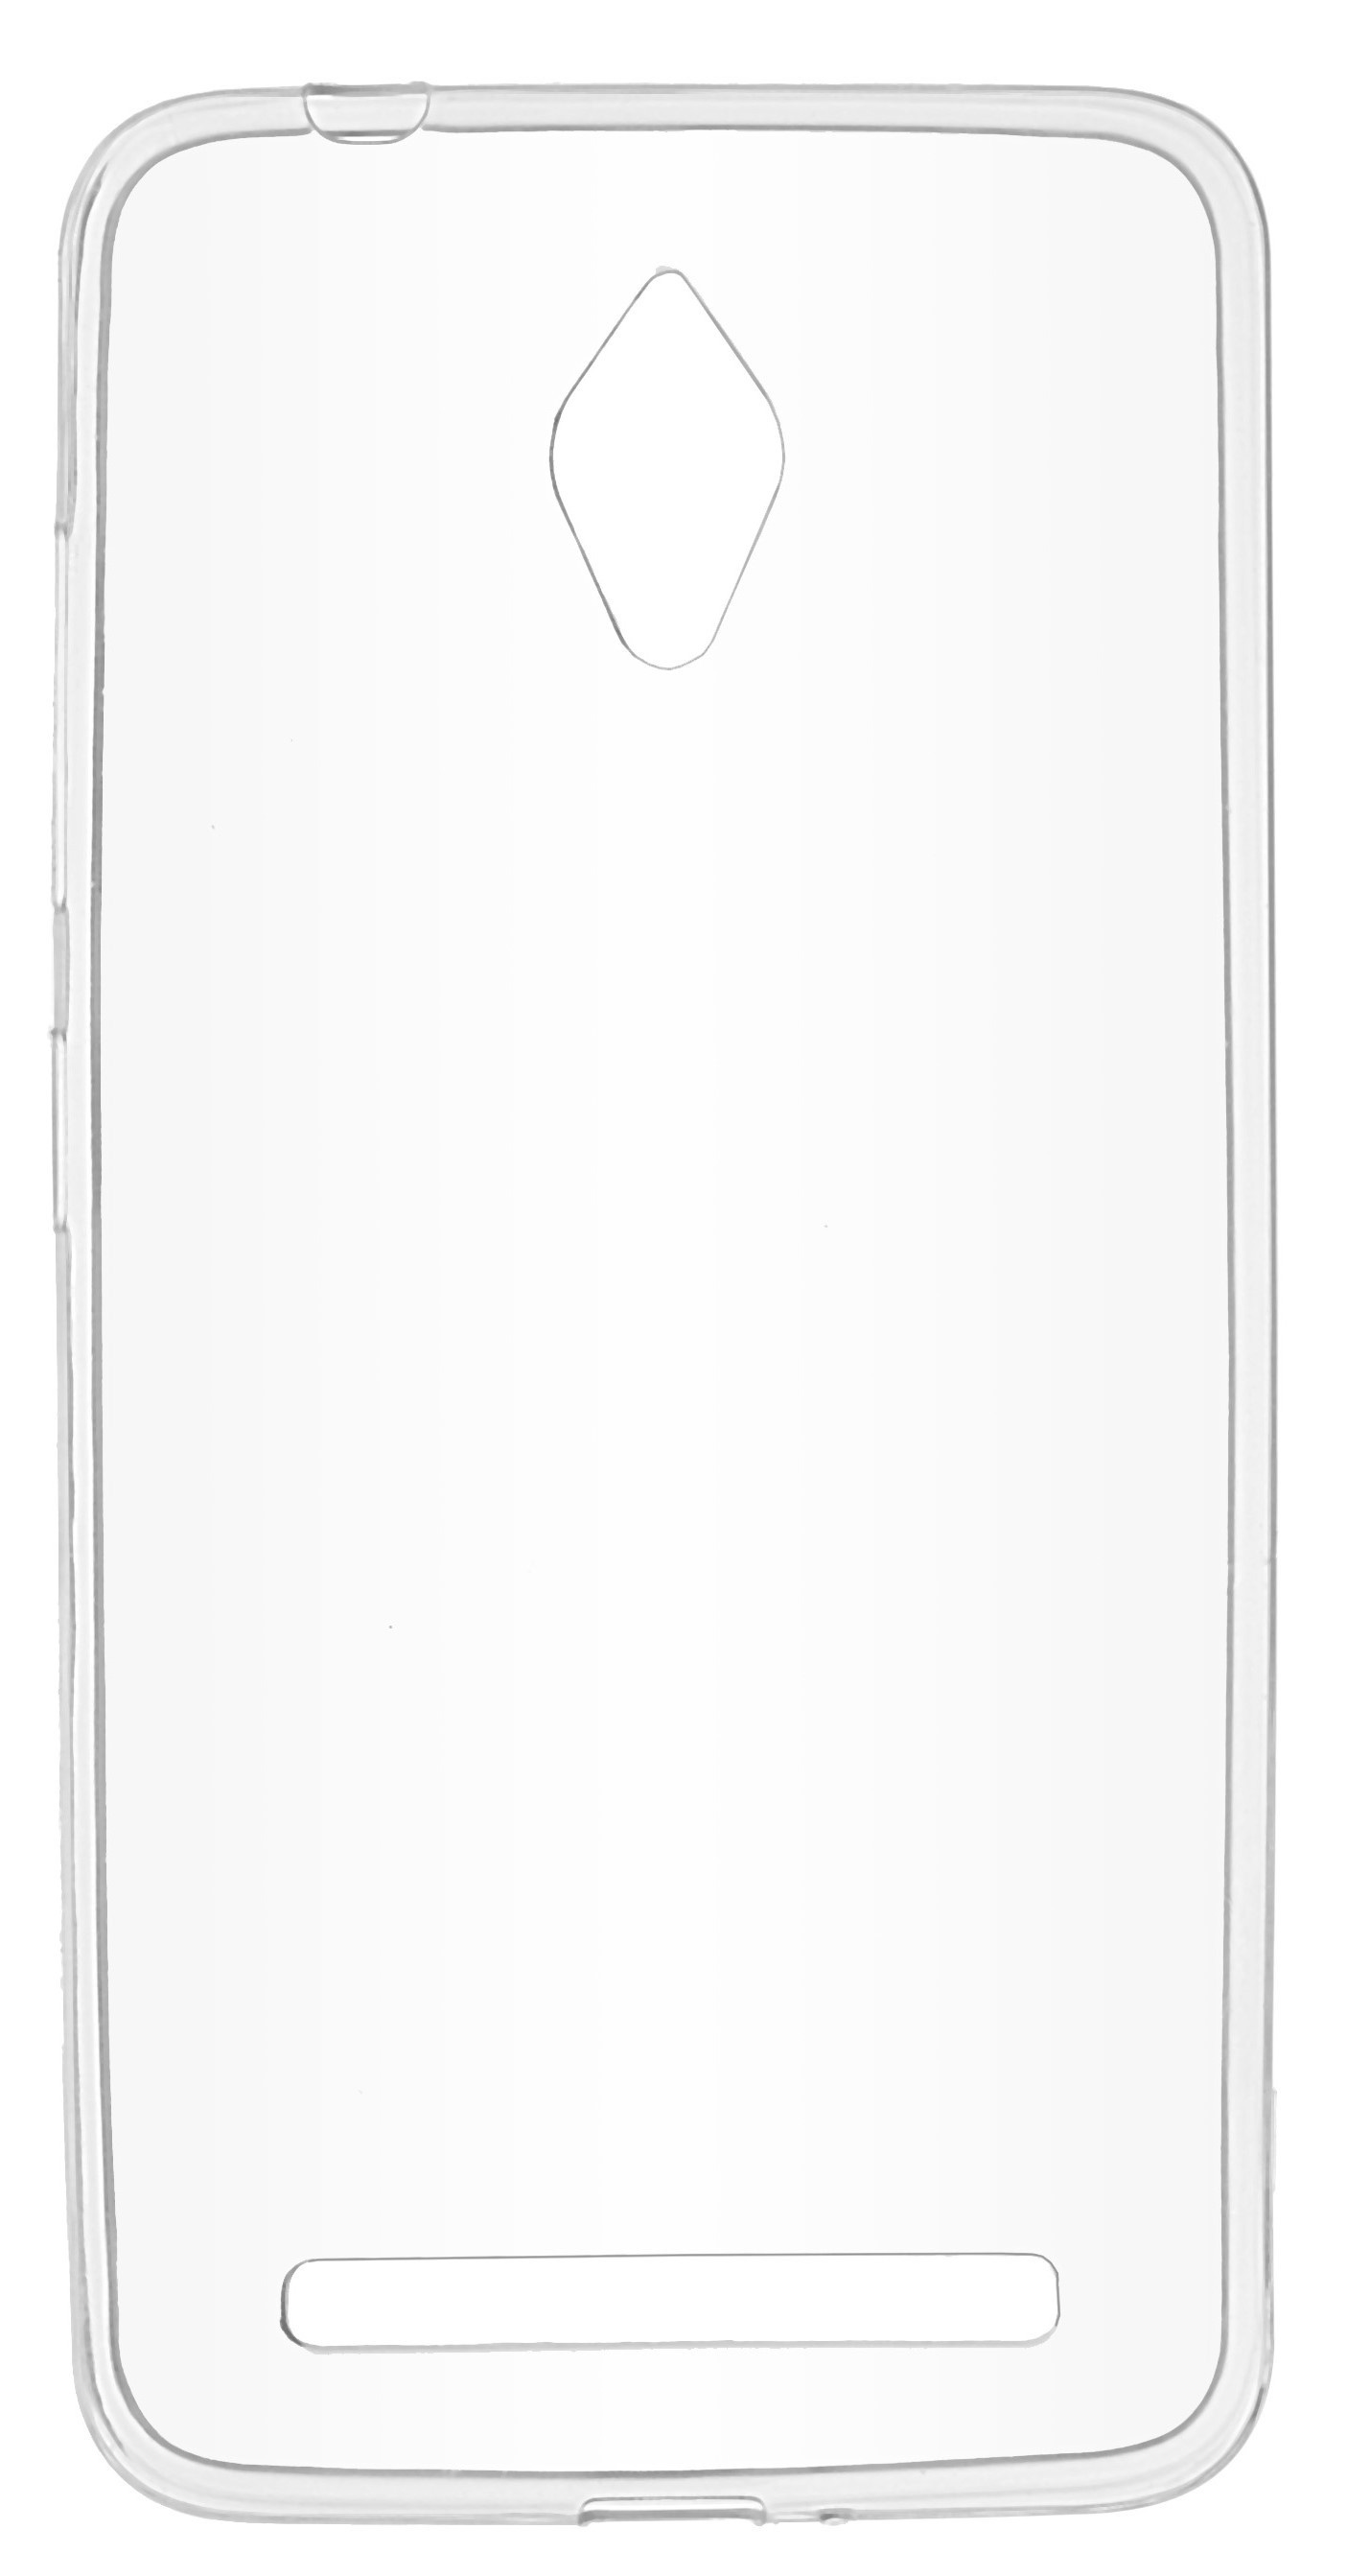 Чехол для сотового телефона skinBOX Slim Silicone, 4630042527799, прозрачный цена и фото